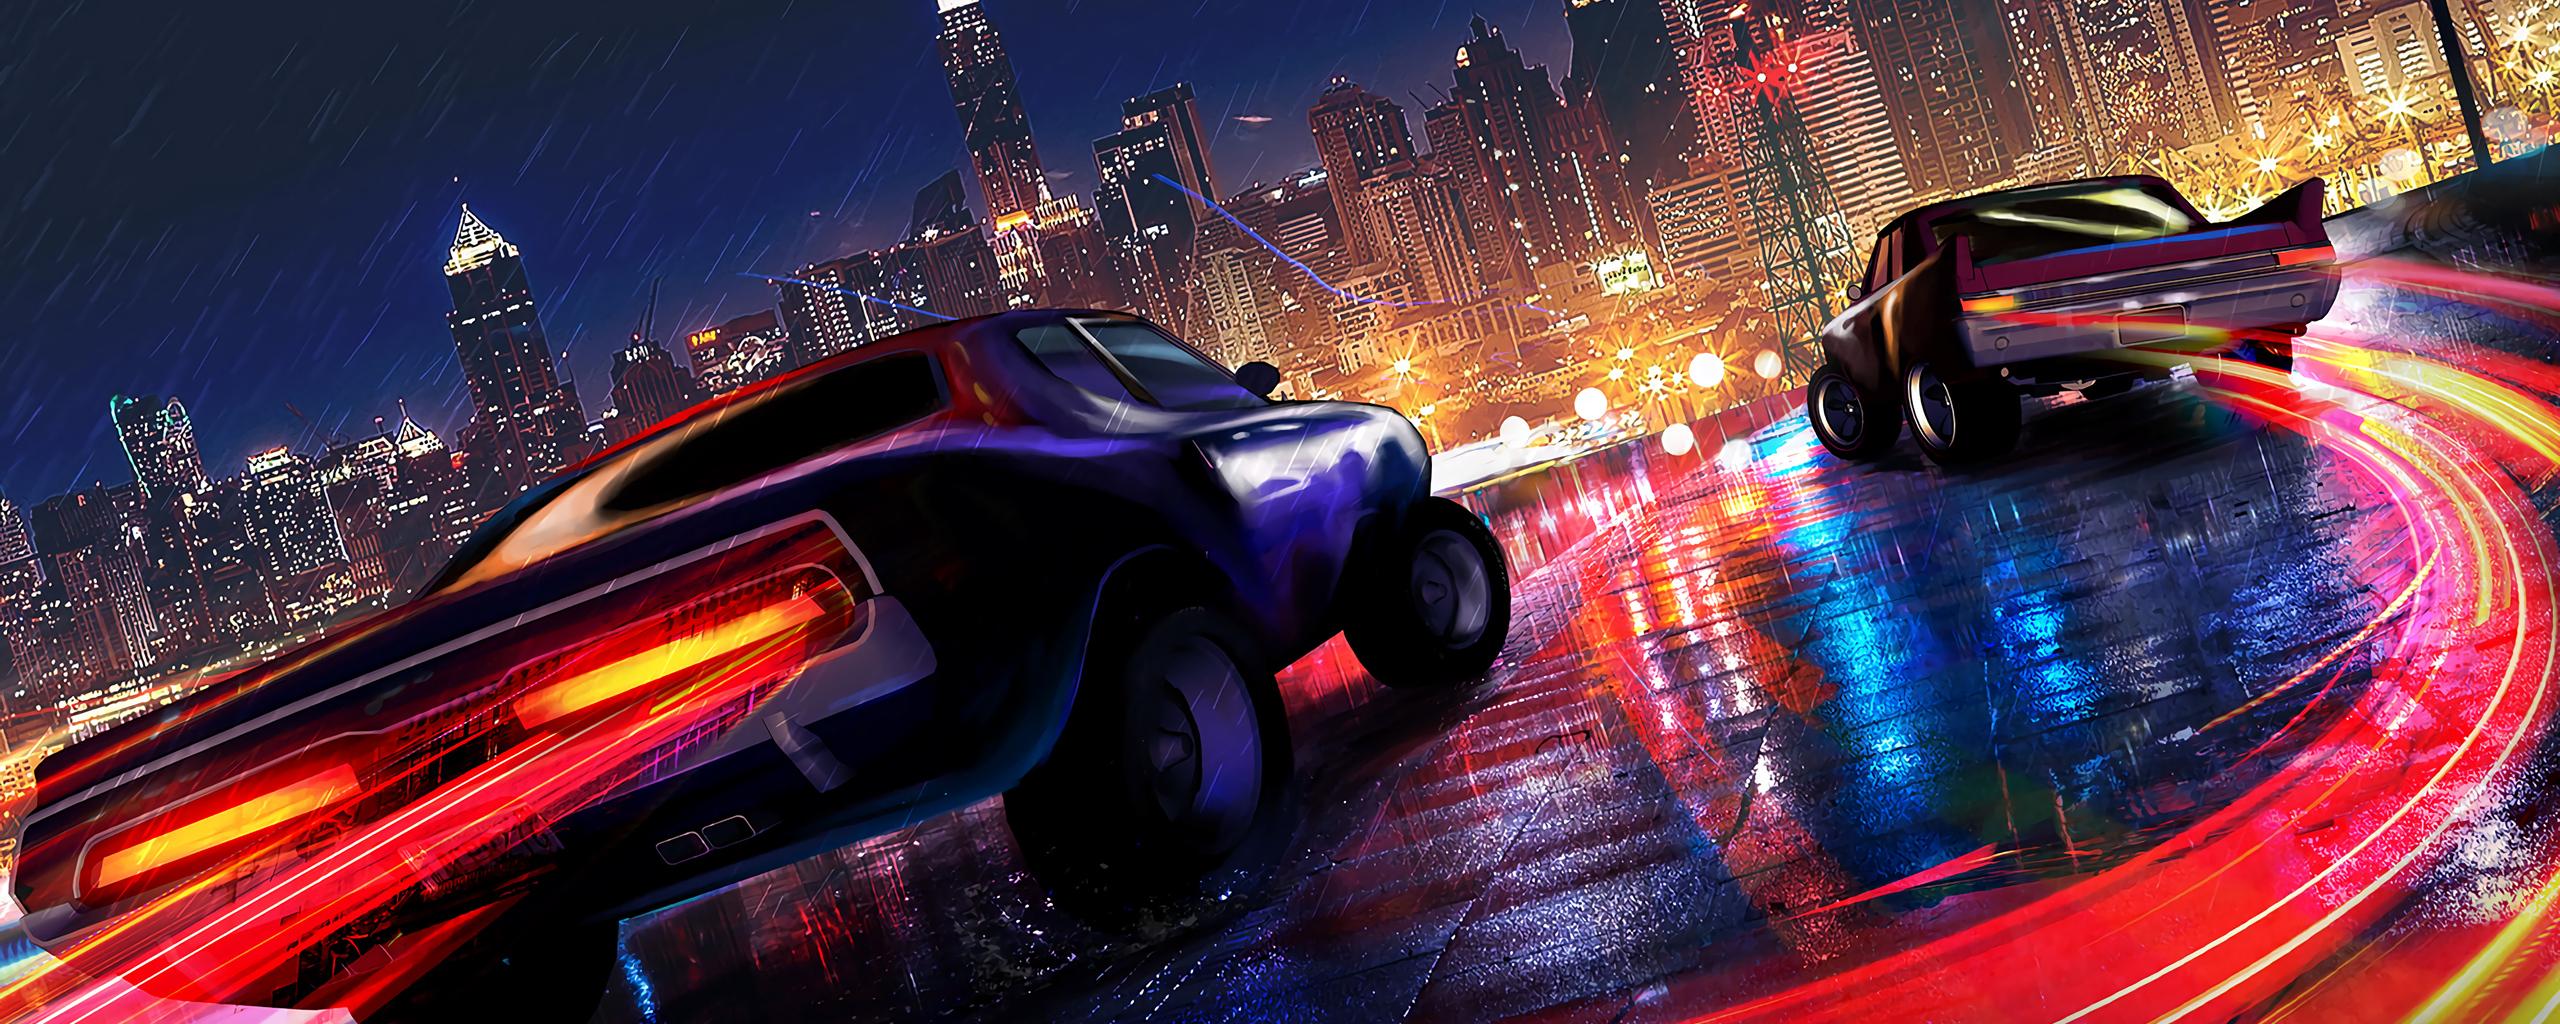 2560x1024 Car Drifting Neon Lights 4k 2560x1024 Resolution ...